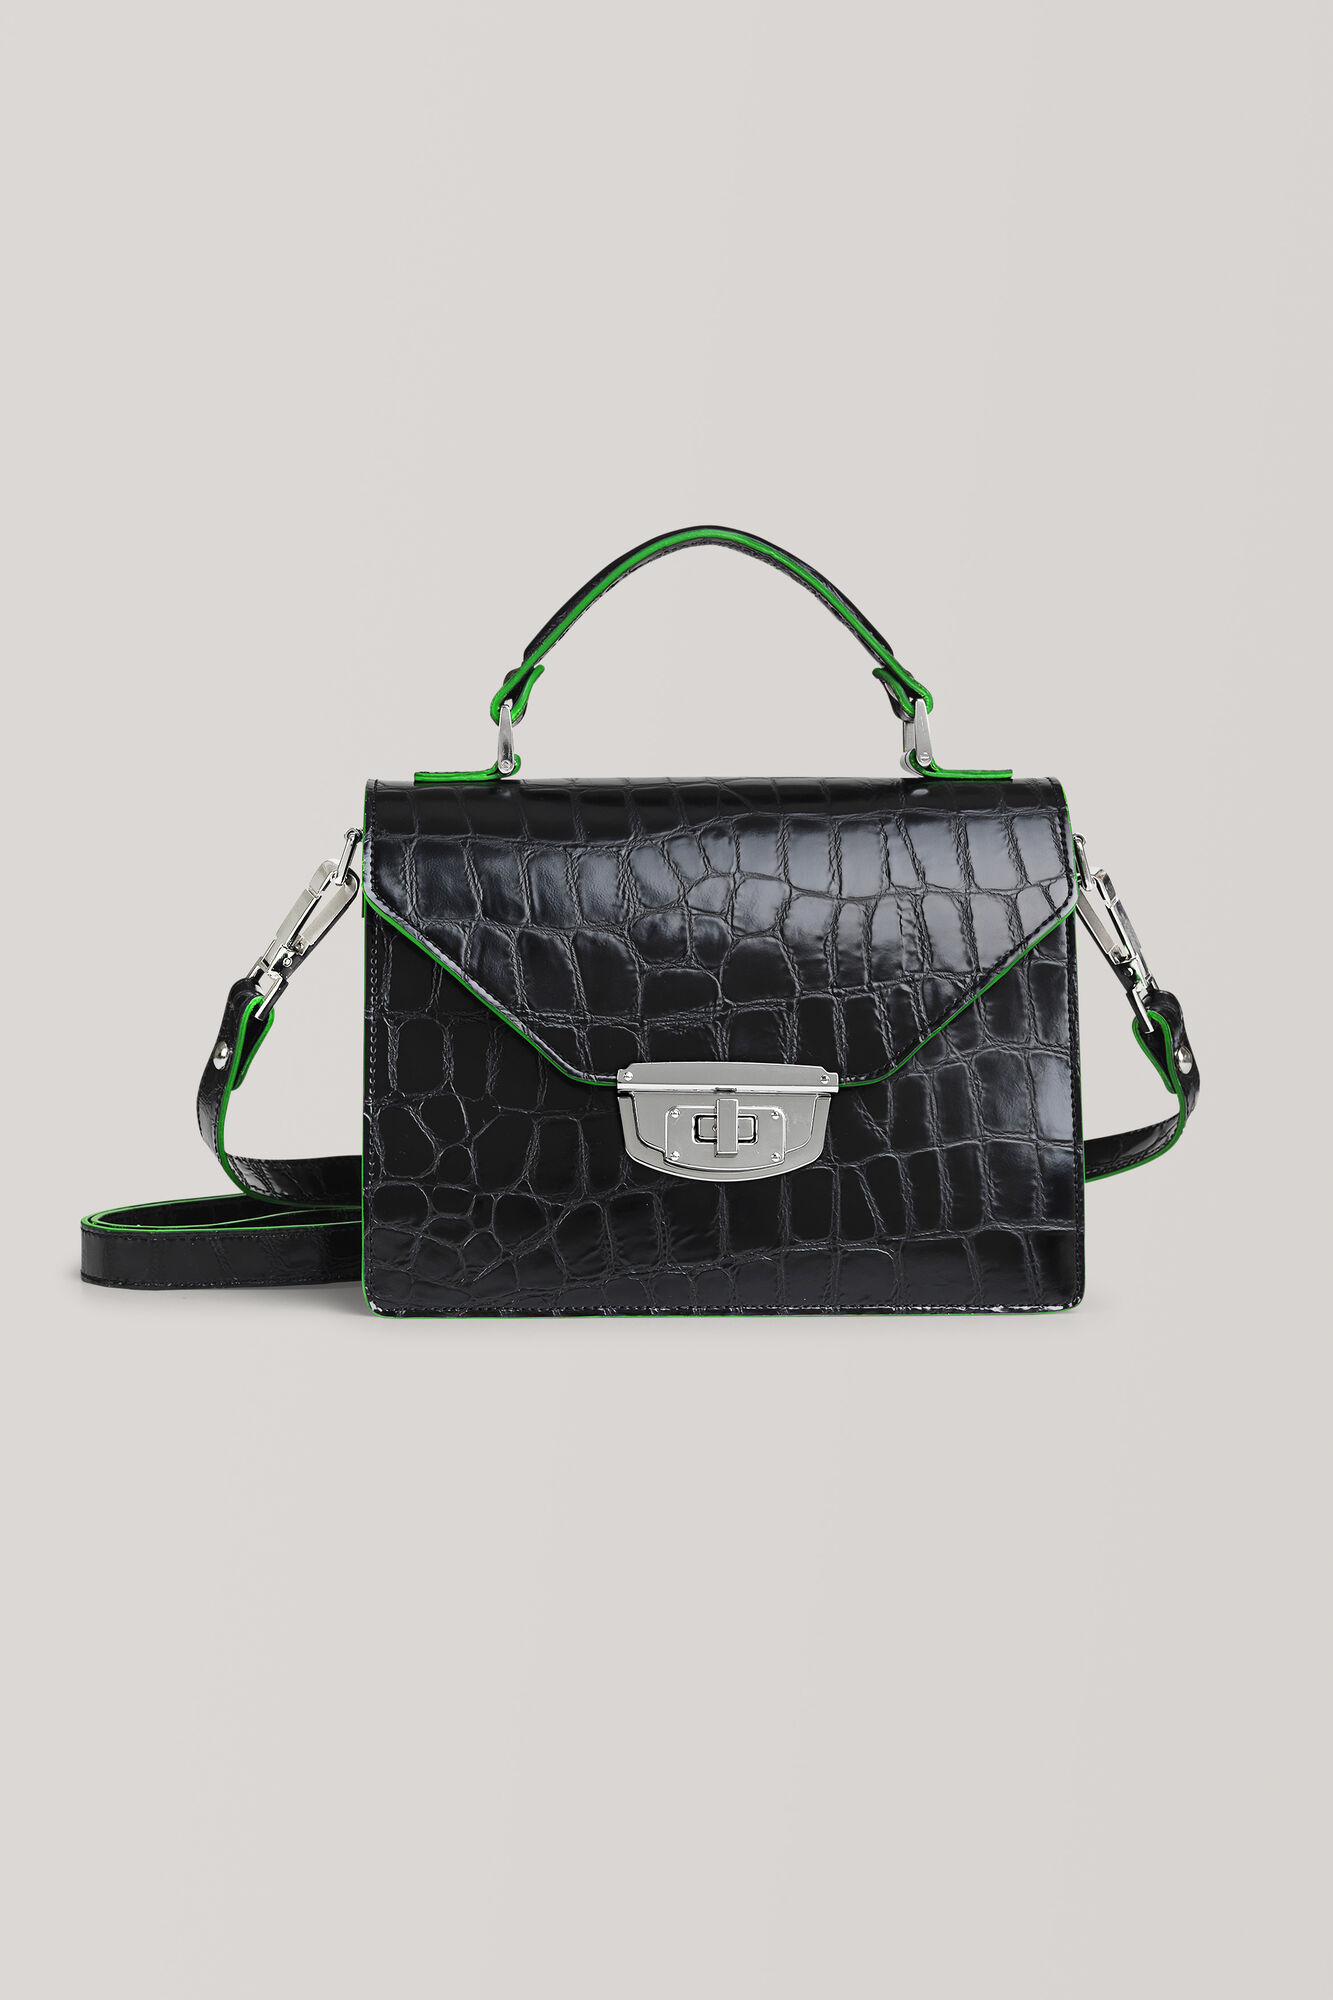 Gallery Accessories Buckle Bag, Black, hi-res